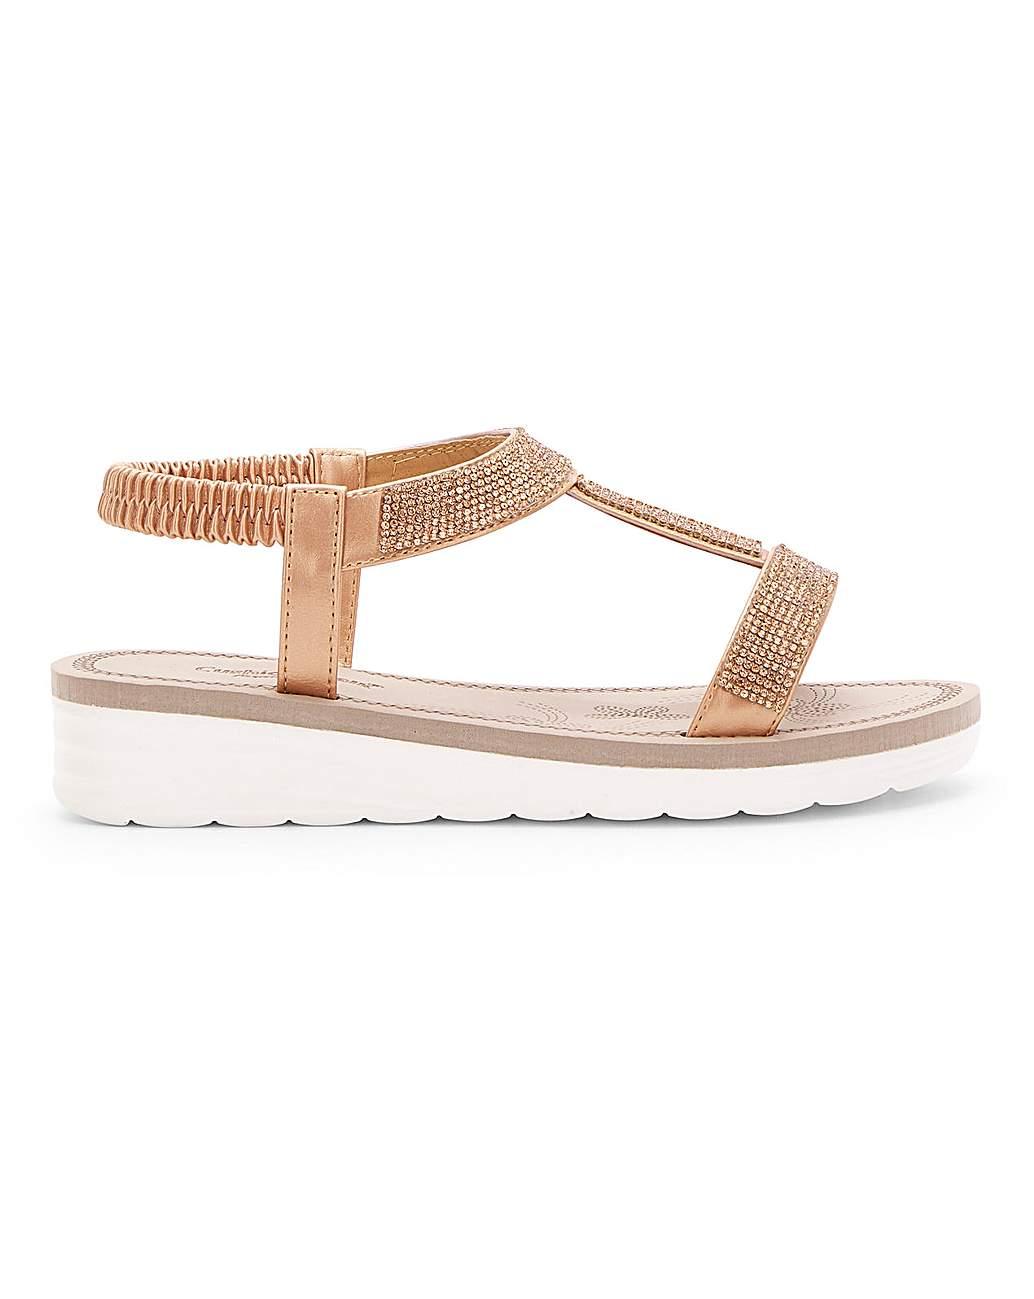 Cushion Walk Diamante Sandals EEE Fit